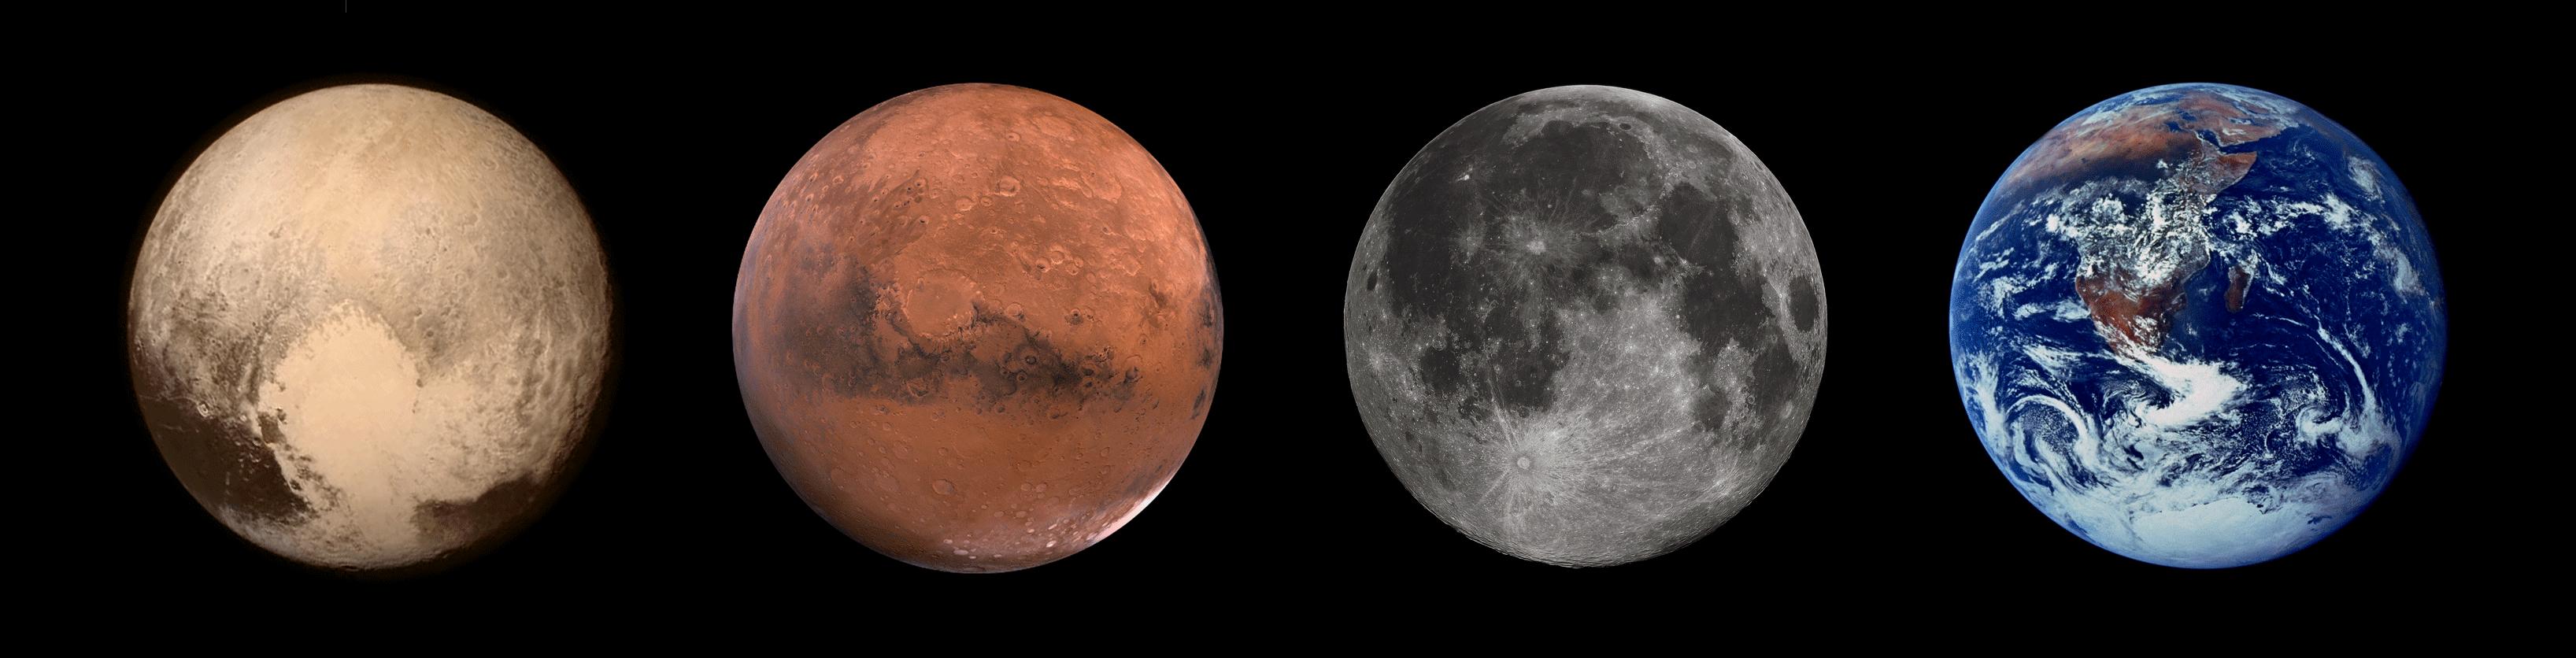 pluto-mars-moon-earth